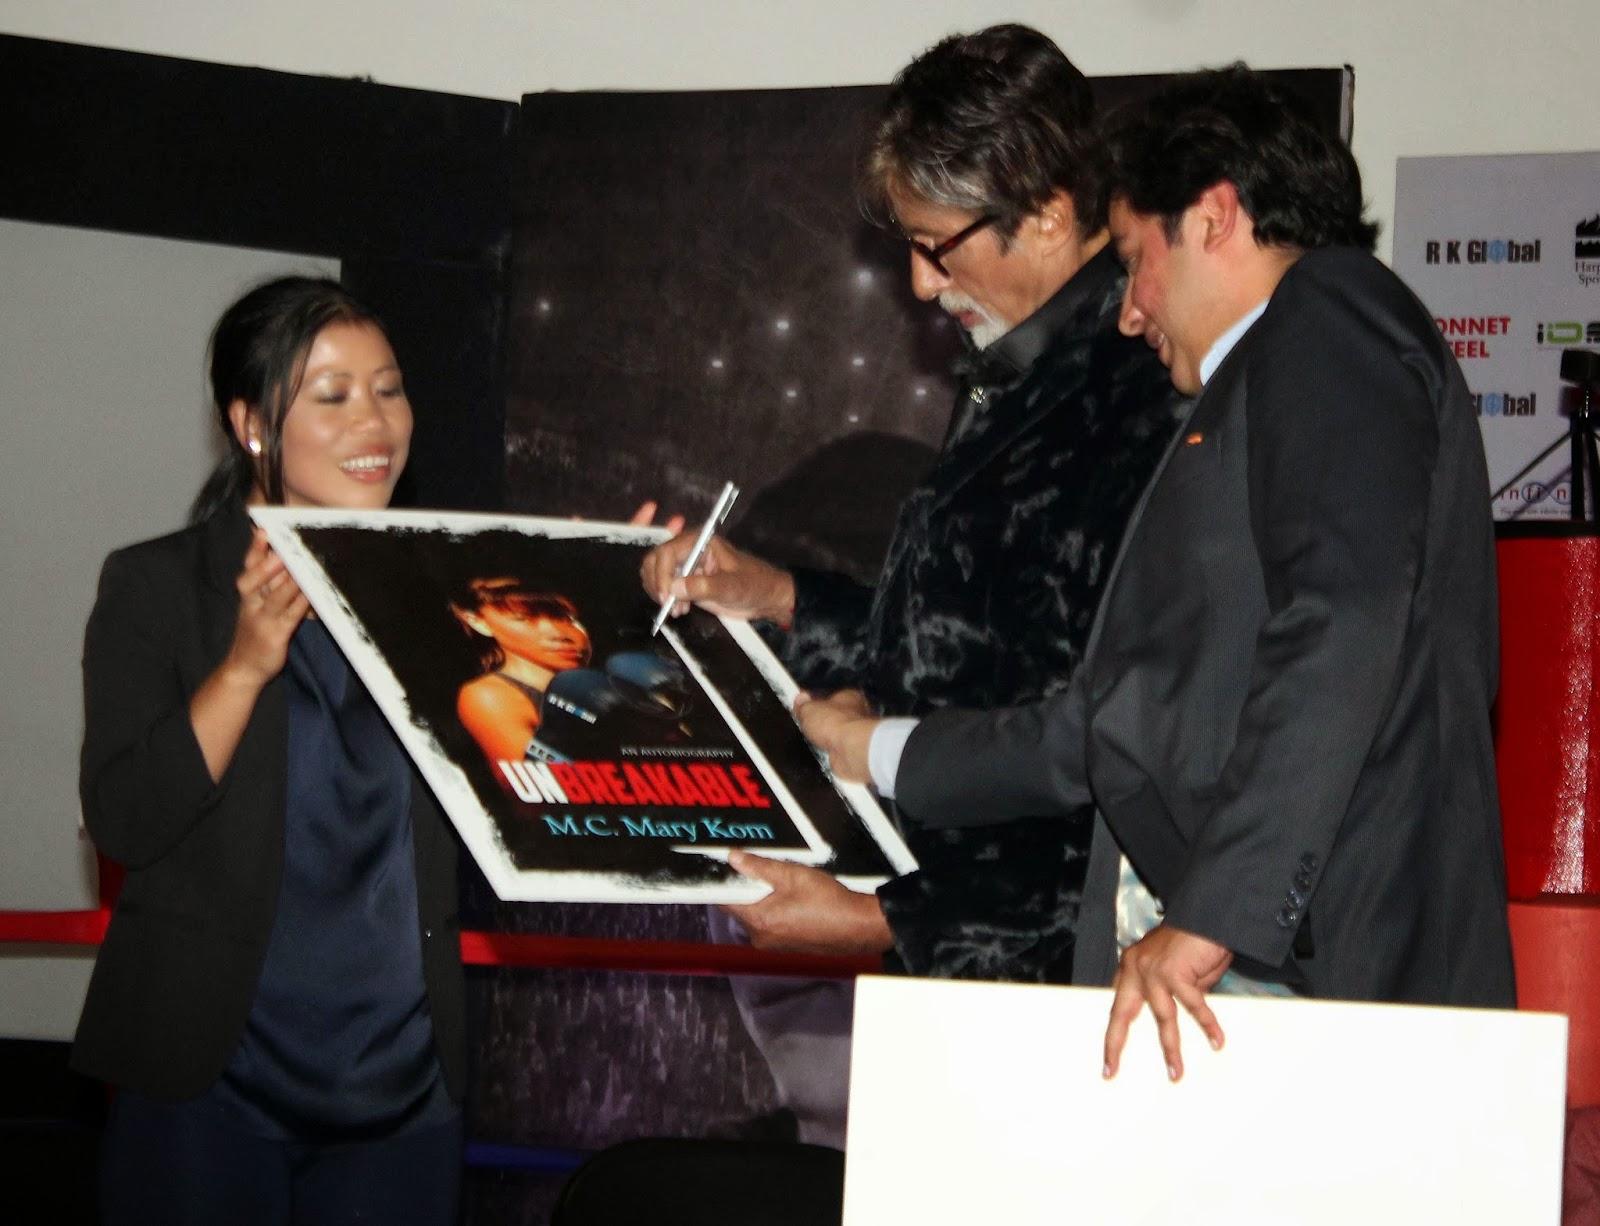 http://4.bp.blogspot.com/-ihFgvBxt1Ck/UqdNx29ptOI/AAAAAAABmjQ/gcx2fw8cAFs/s1600/Amitabh-Launch-The-Biography-Of-Olympics-Medallist-And-Boxer-Mary-Kom-48.JPG